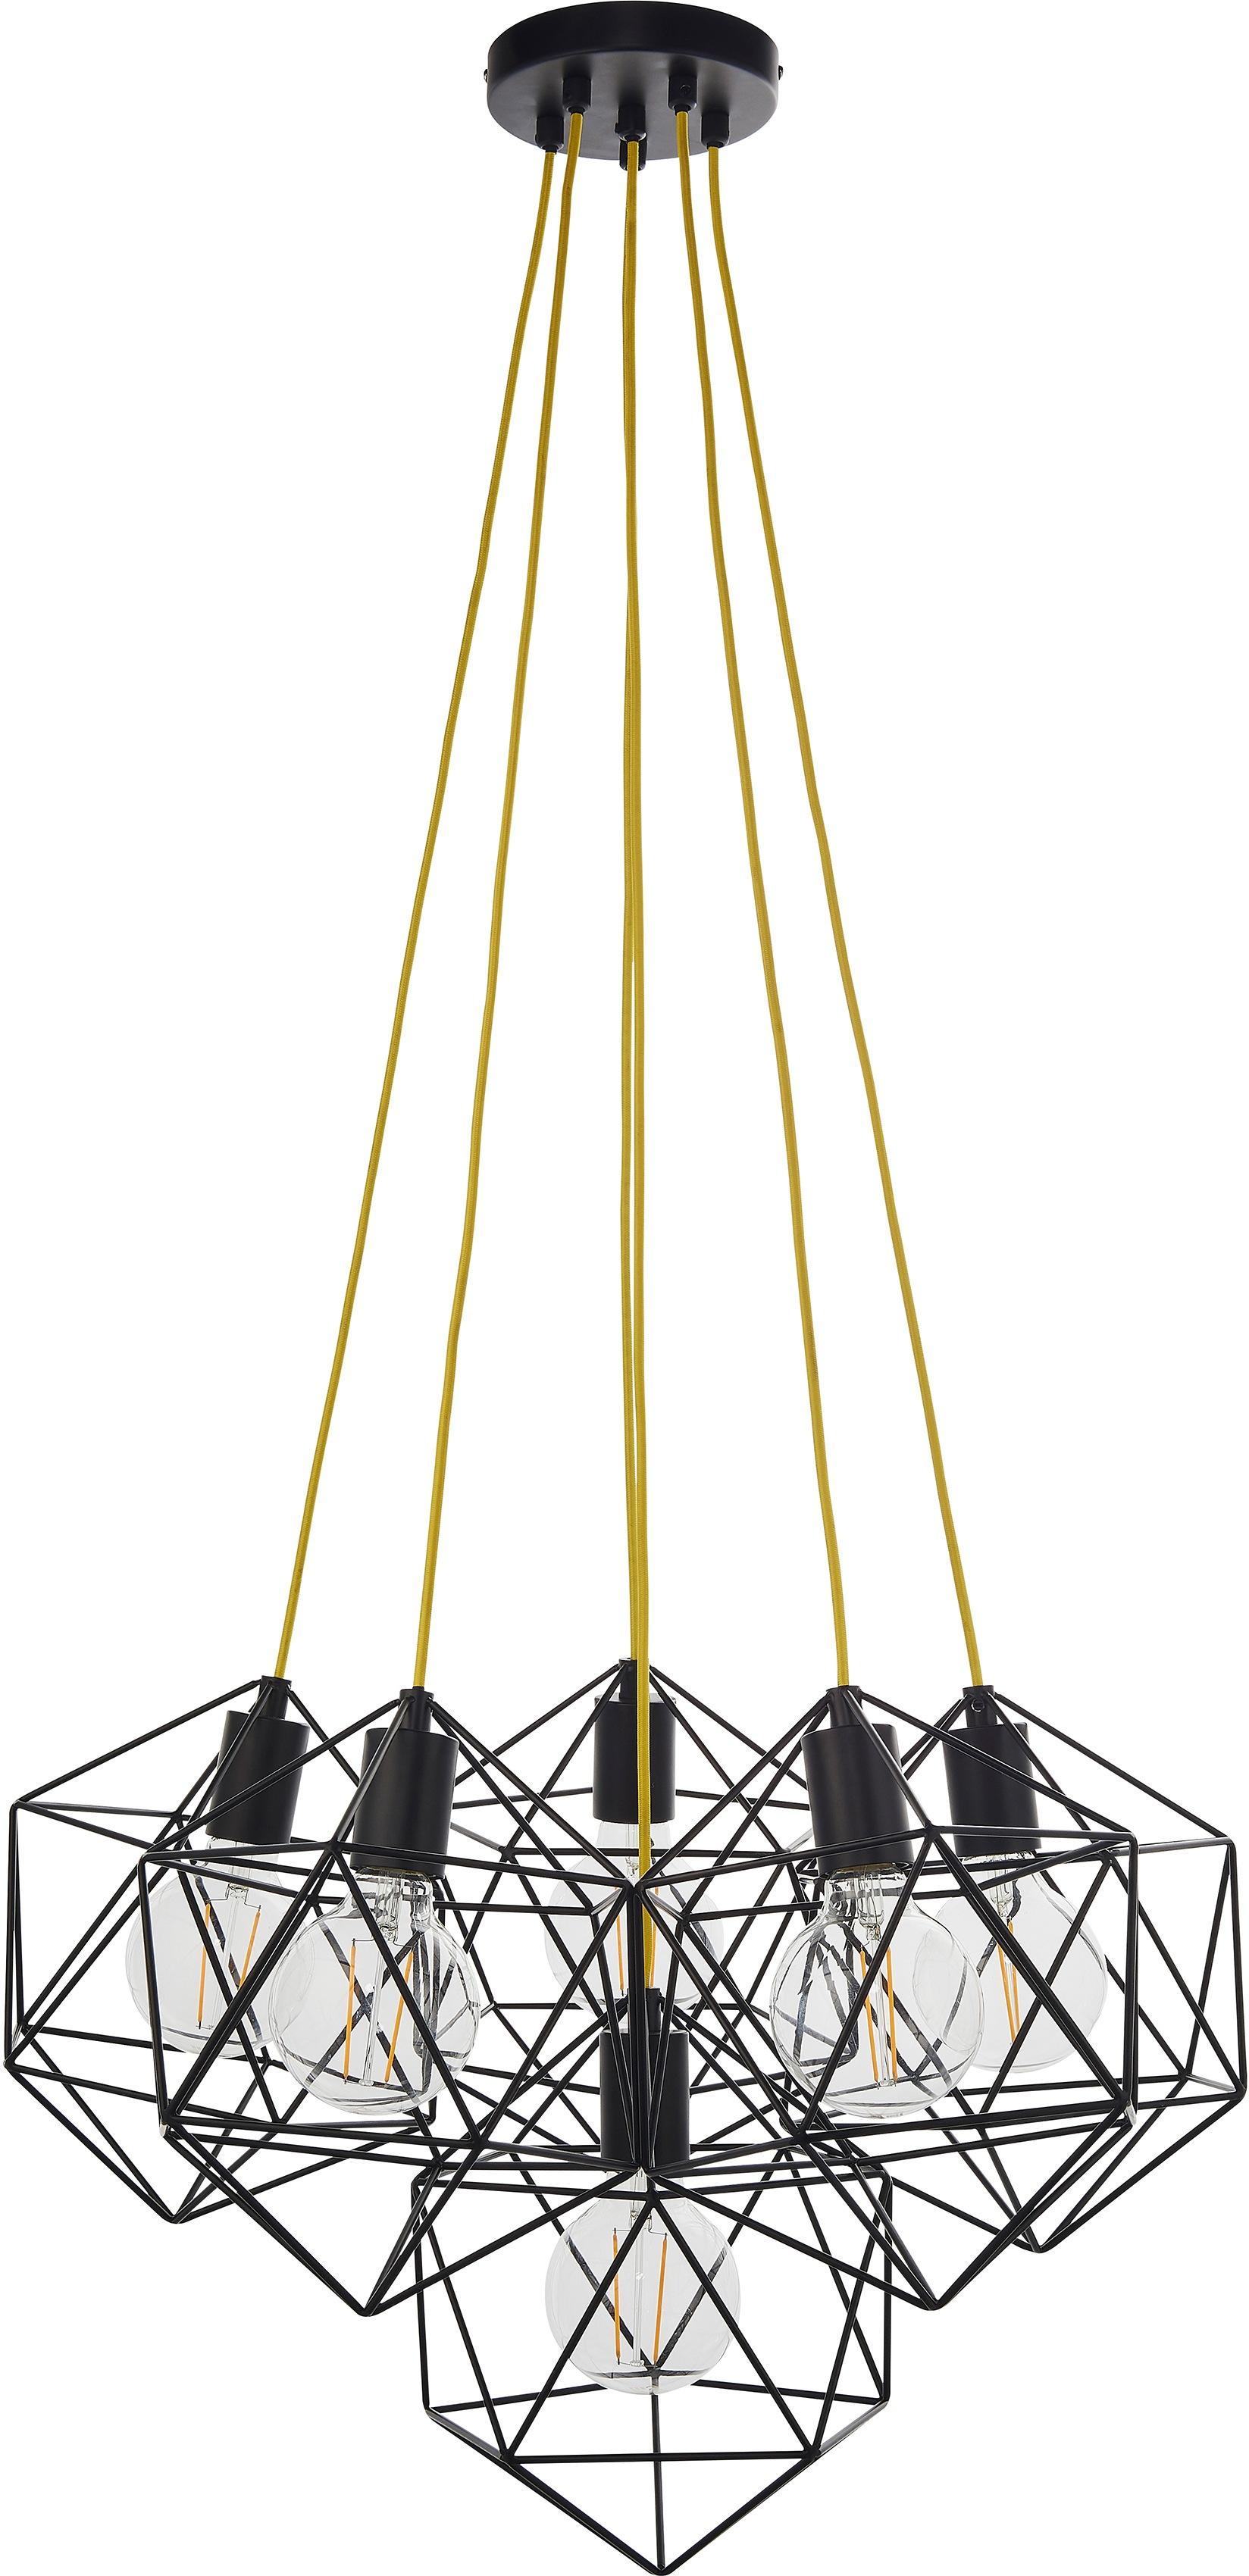 Brilliant Leuchten Pendelleuchte Amelita, E27, 1 St., Pendelleuchte, 6-flammig, messing antik